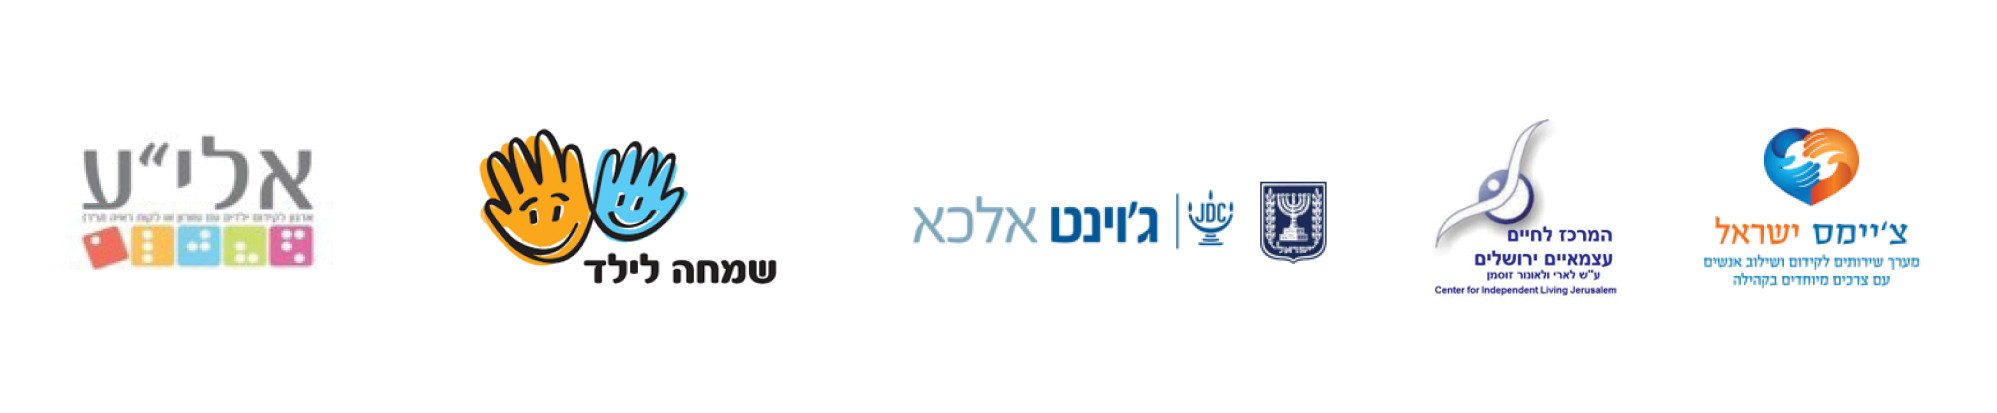 logos_in_line_2021_B8.jpg